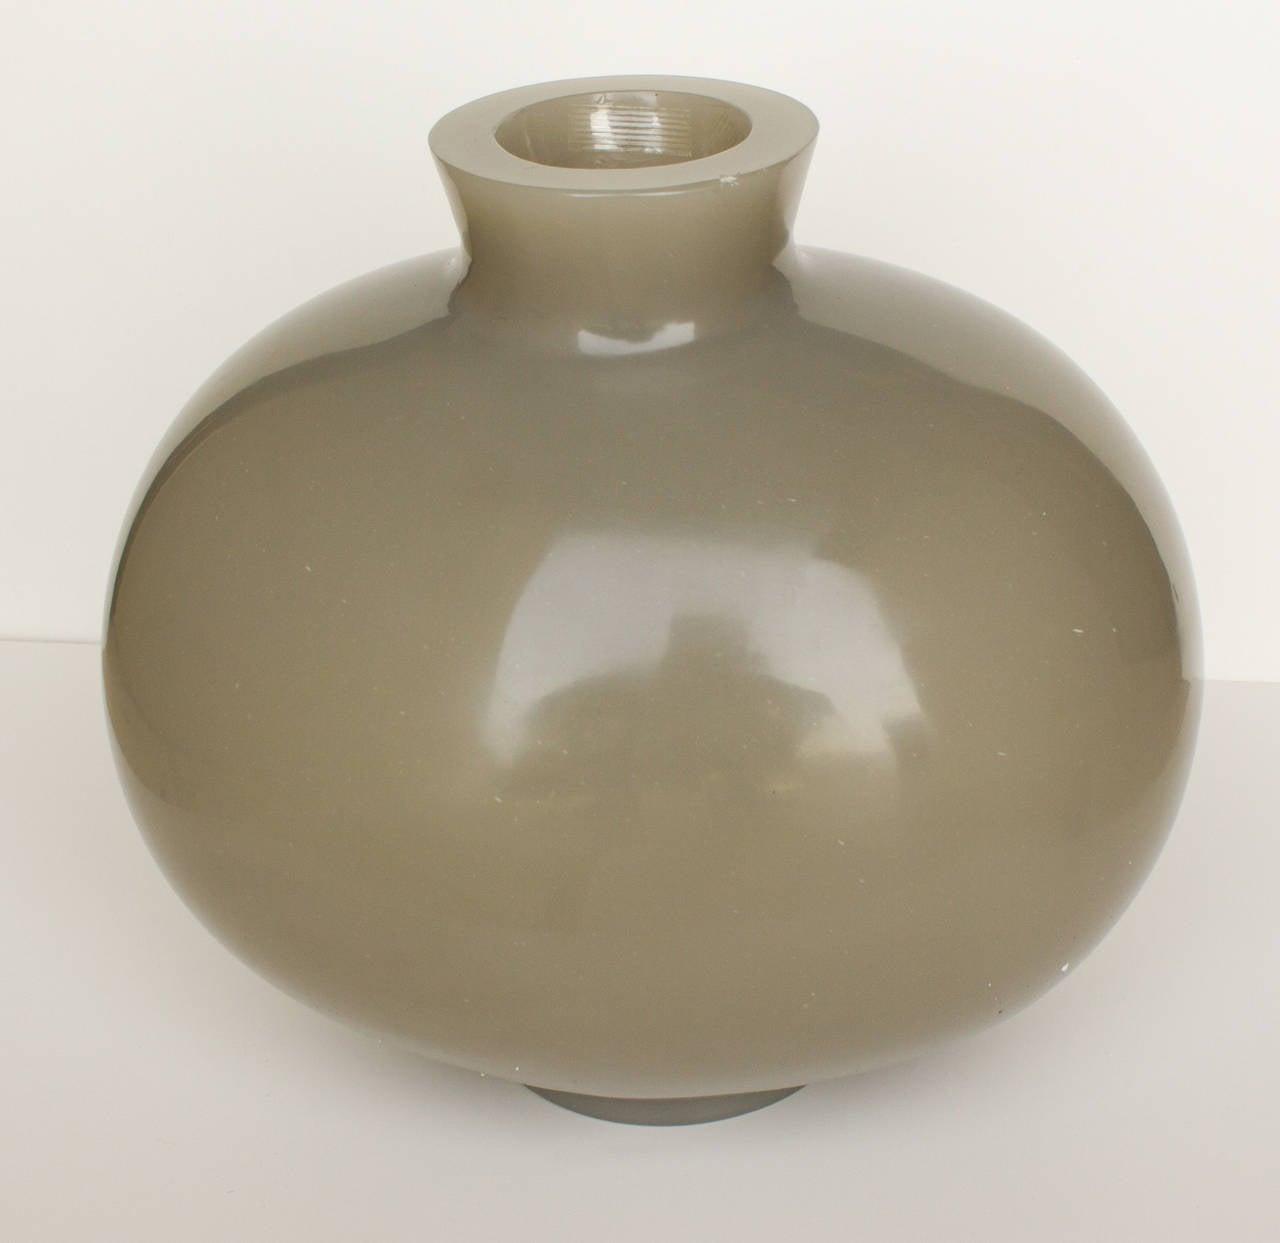 American Robert Kuo Carnelian Grey Cocoon Vase For Sale